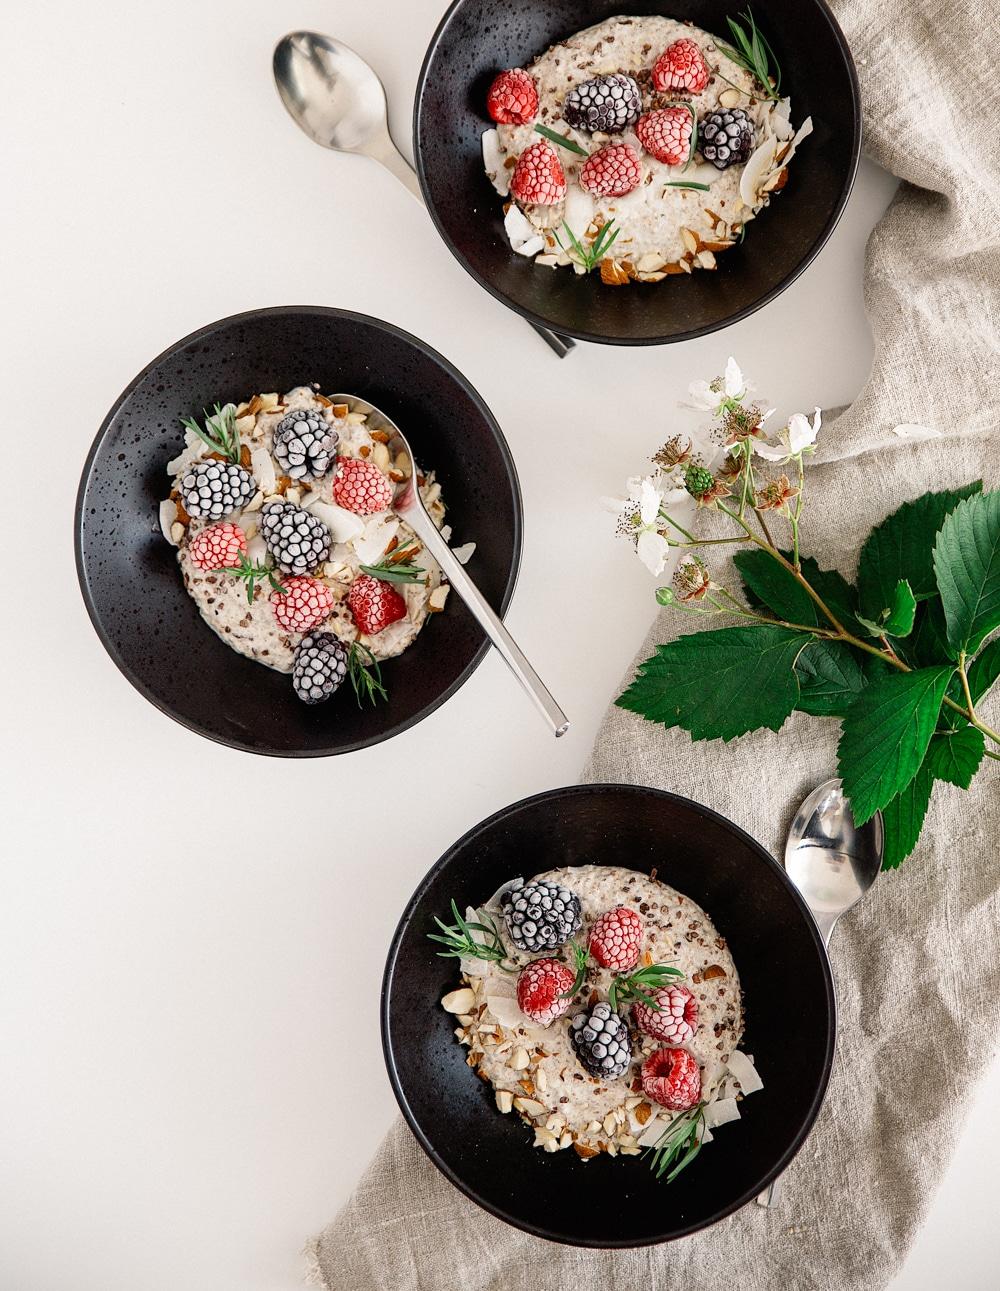 køleskabsgrød, overnight chiagrød, sund morgenmad